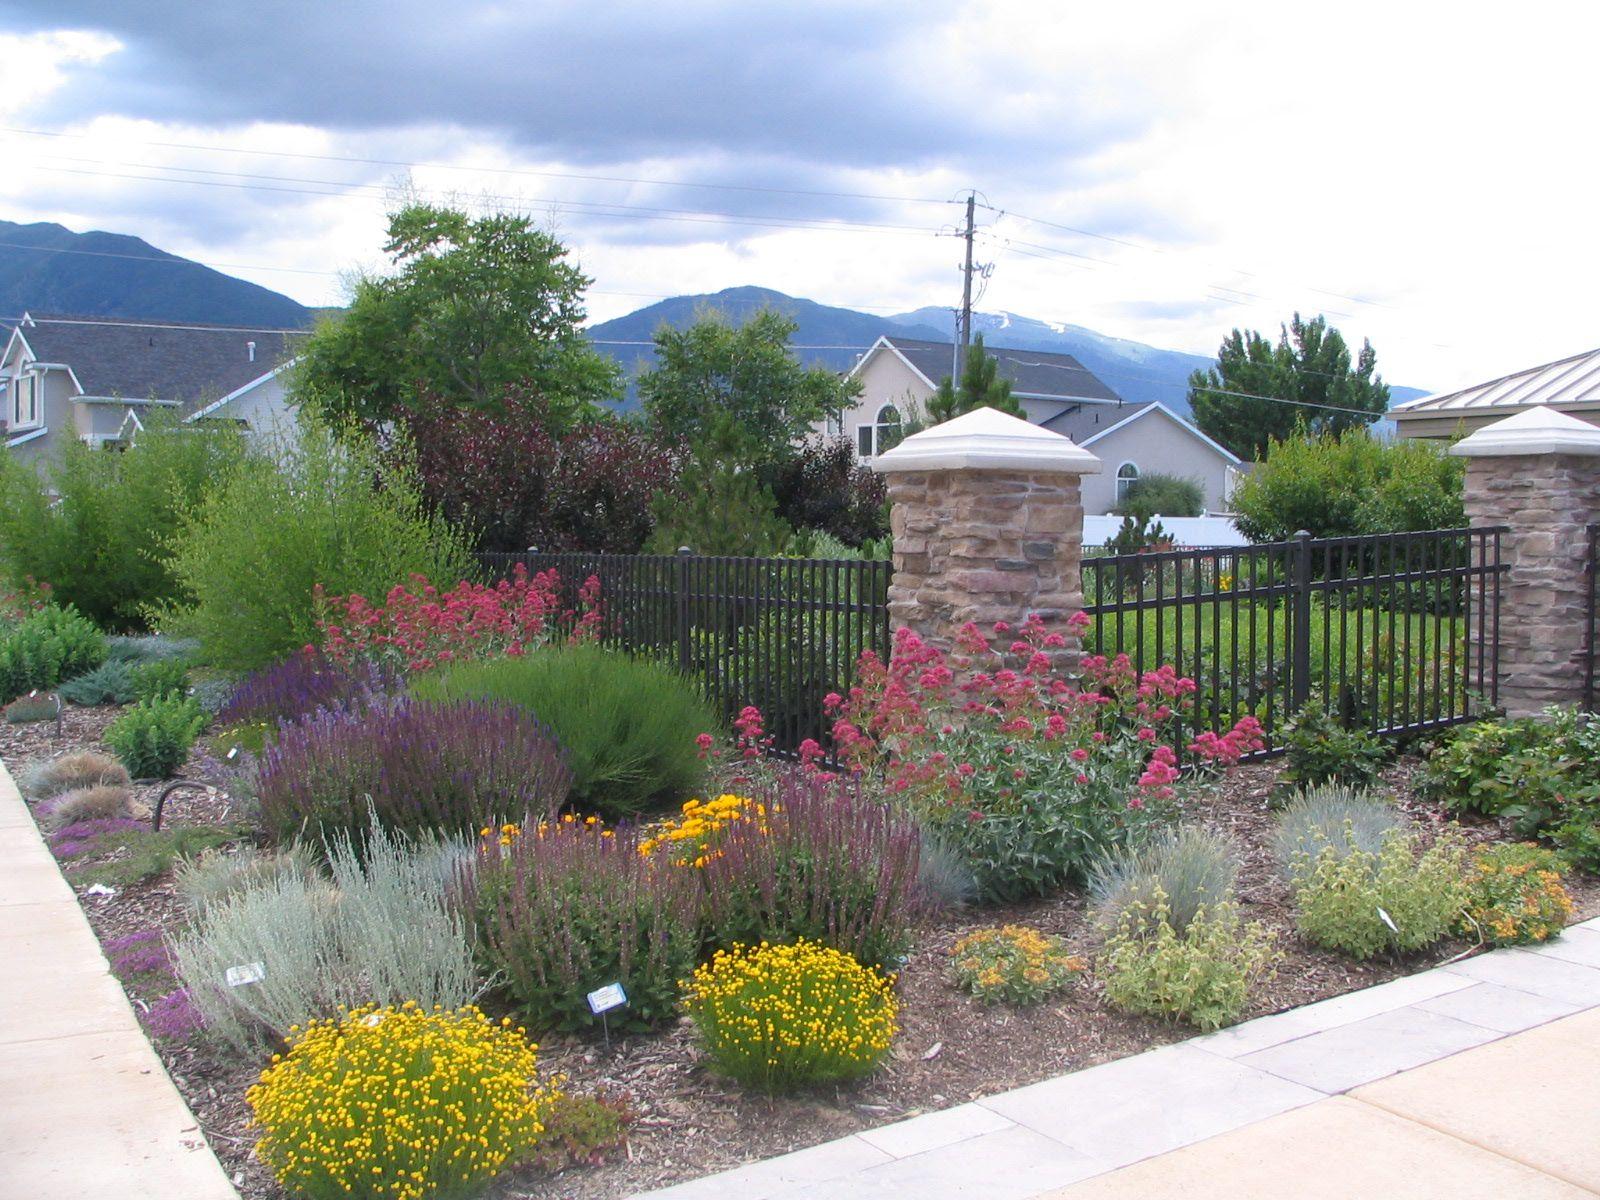 desert horticulture - dixie gardener - dixiegardener